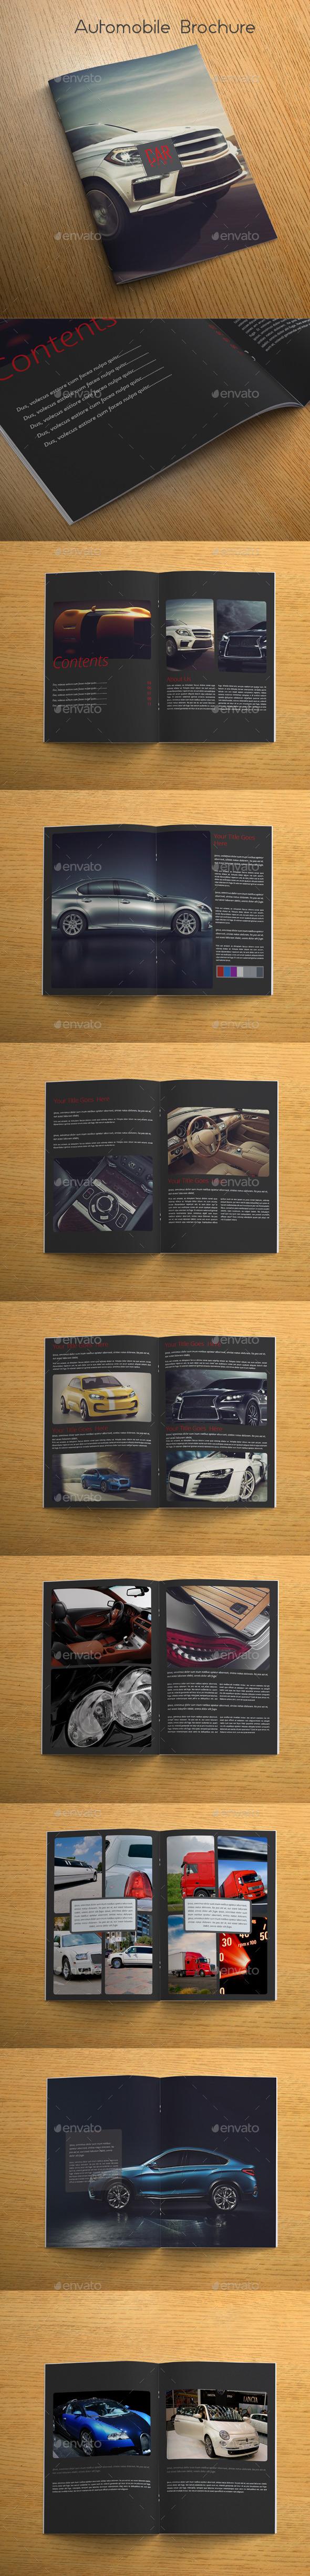 Automobile Brochure - Catalogs Brochures